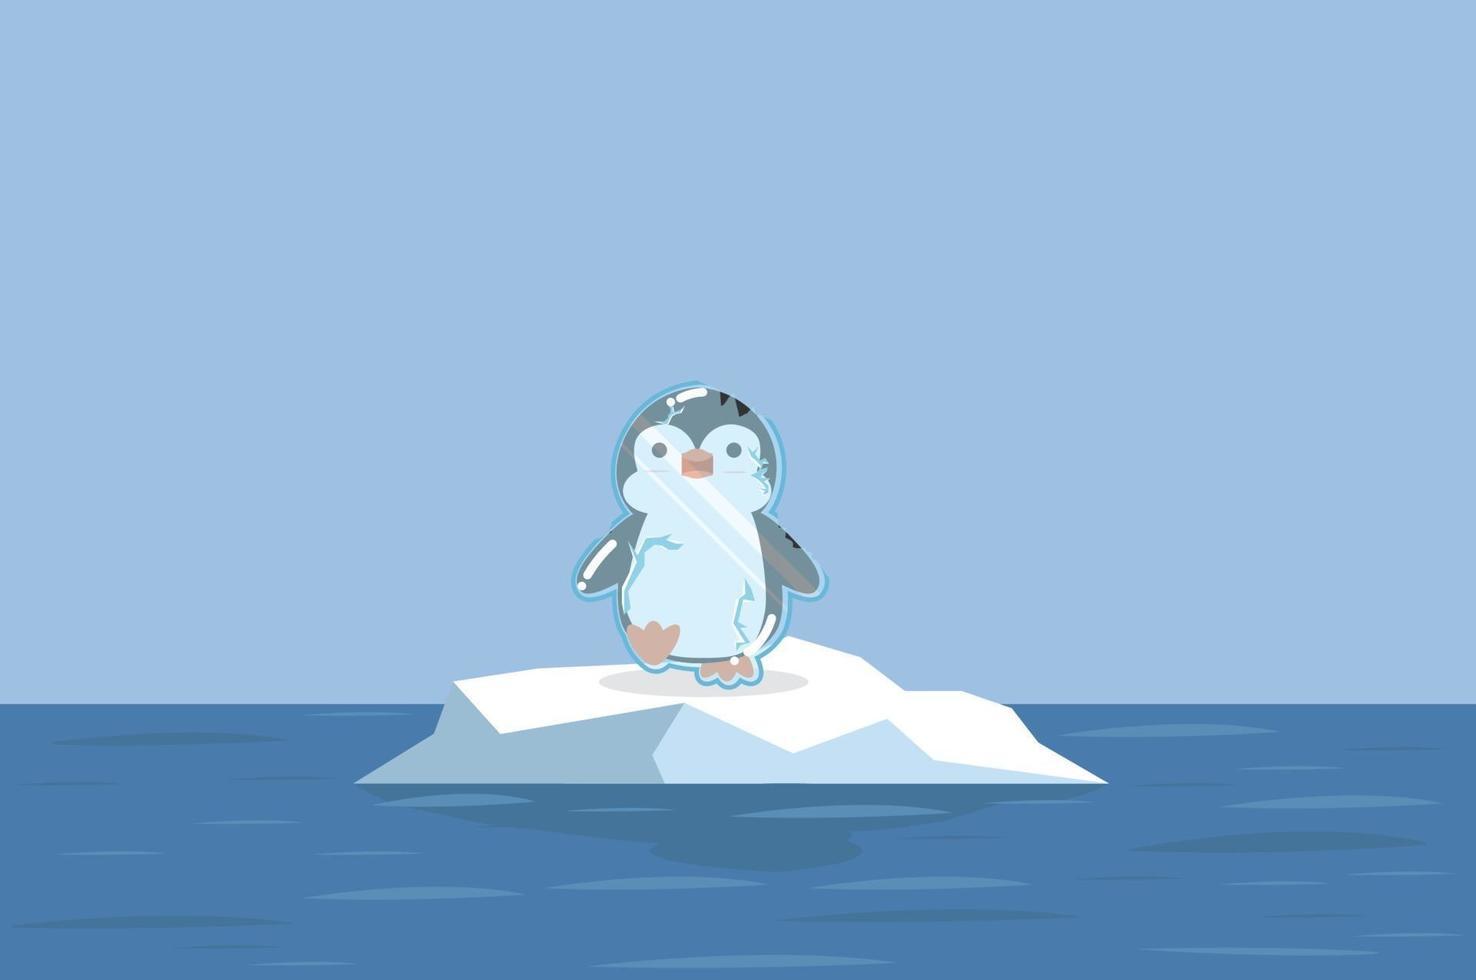 pinguim fofo congelado com pólo norte ártico vetor